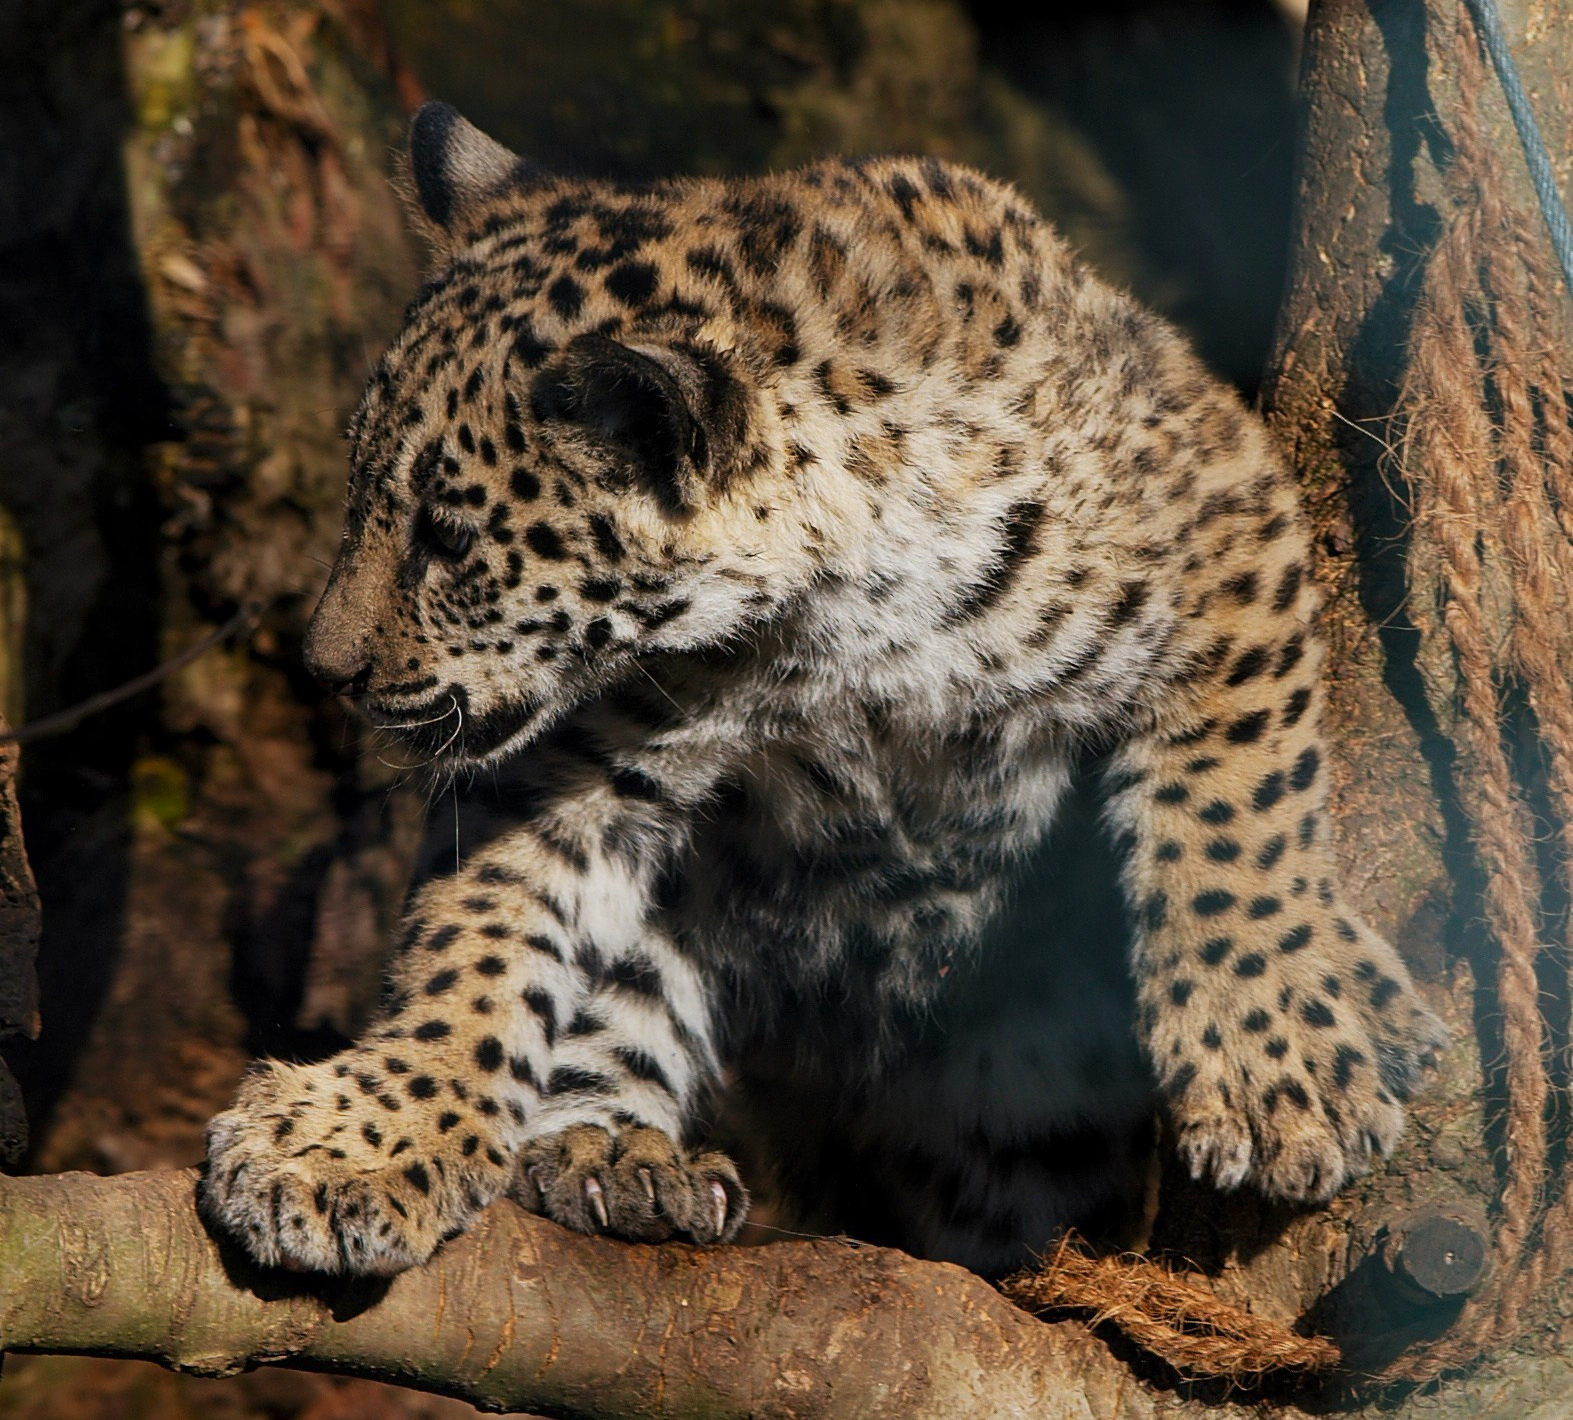 Panthera_onca_zoo_Salzburg_2009_09